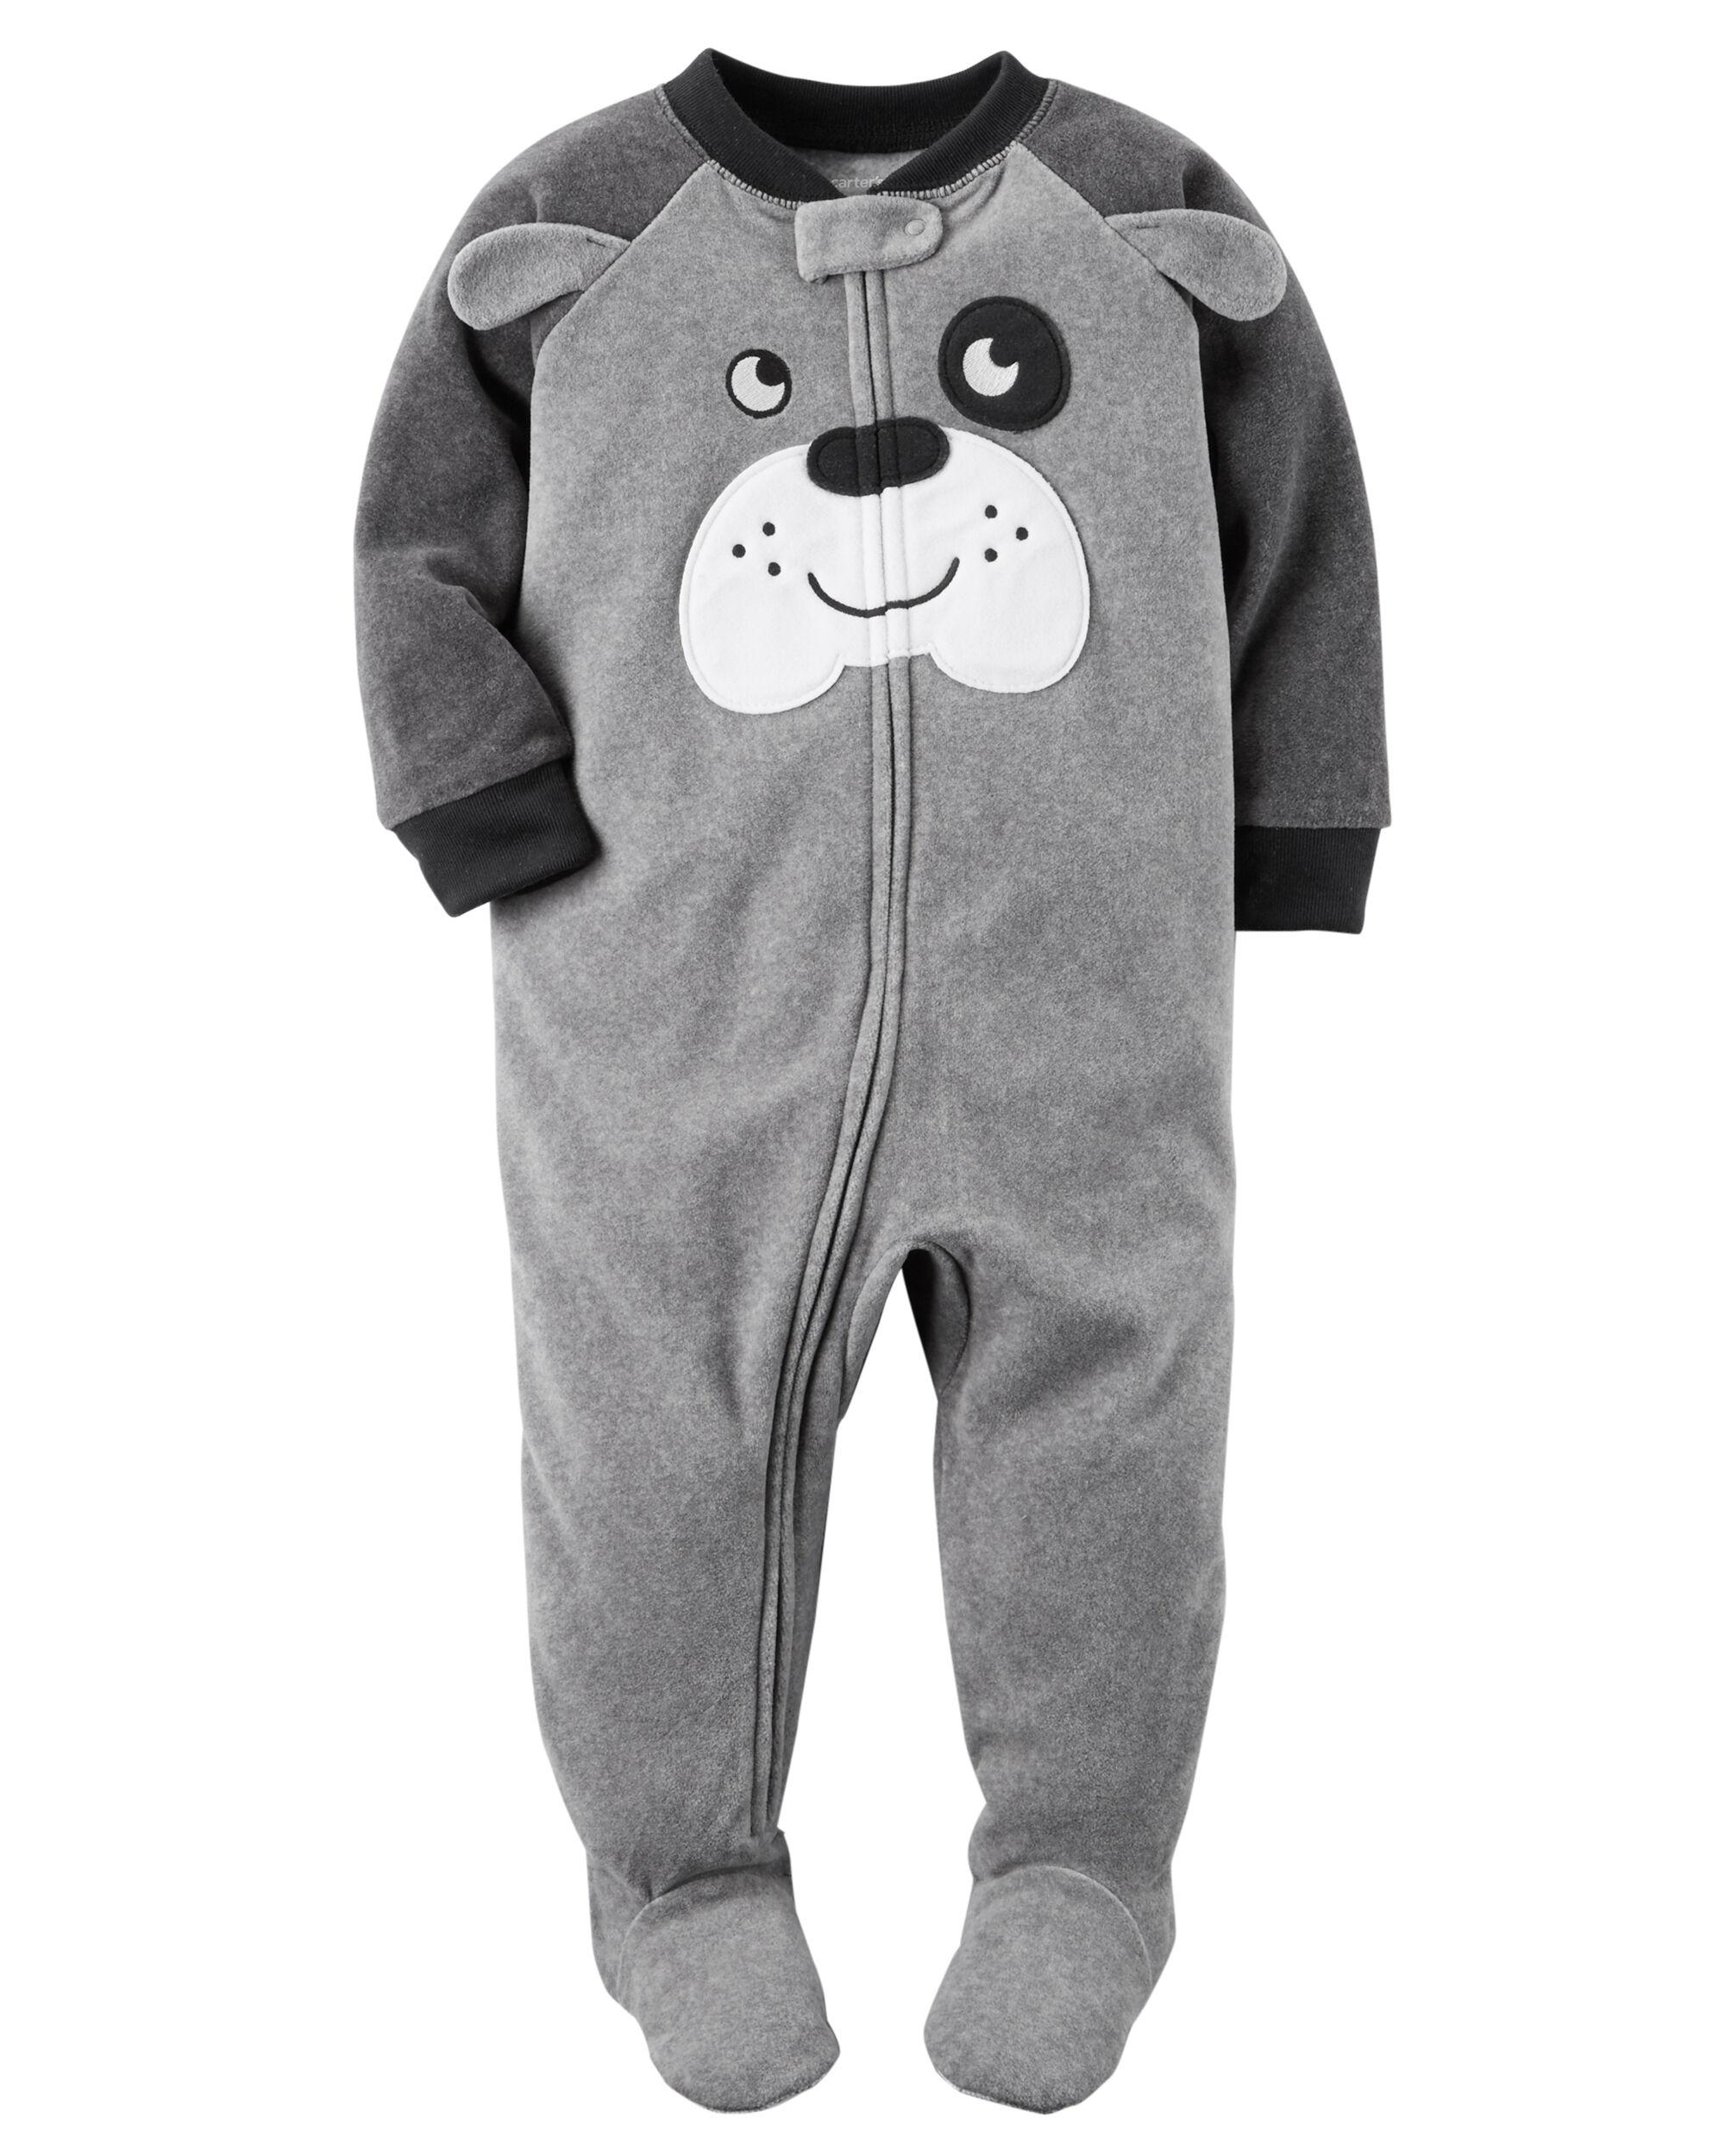 cotton carters baby one sleeper v up ca pyjamas boy dinosaur en zip piece sleepers